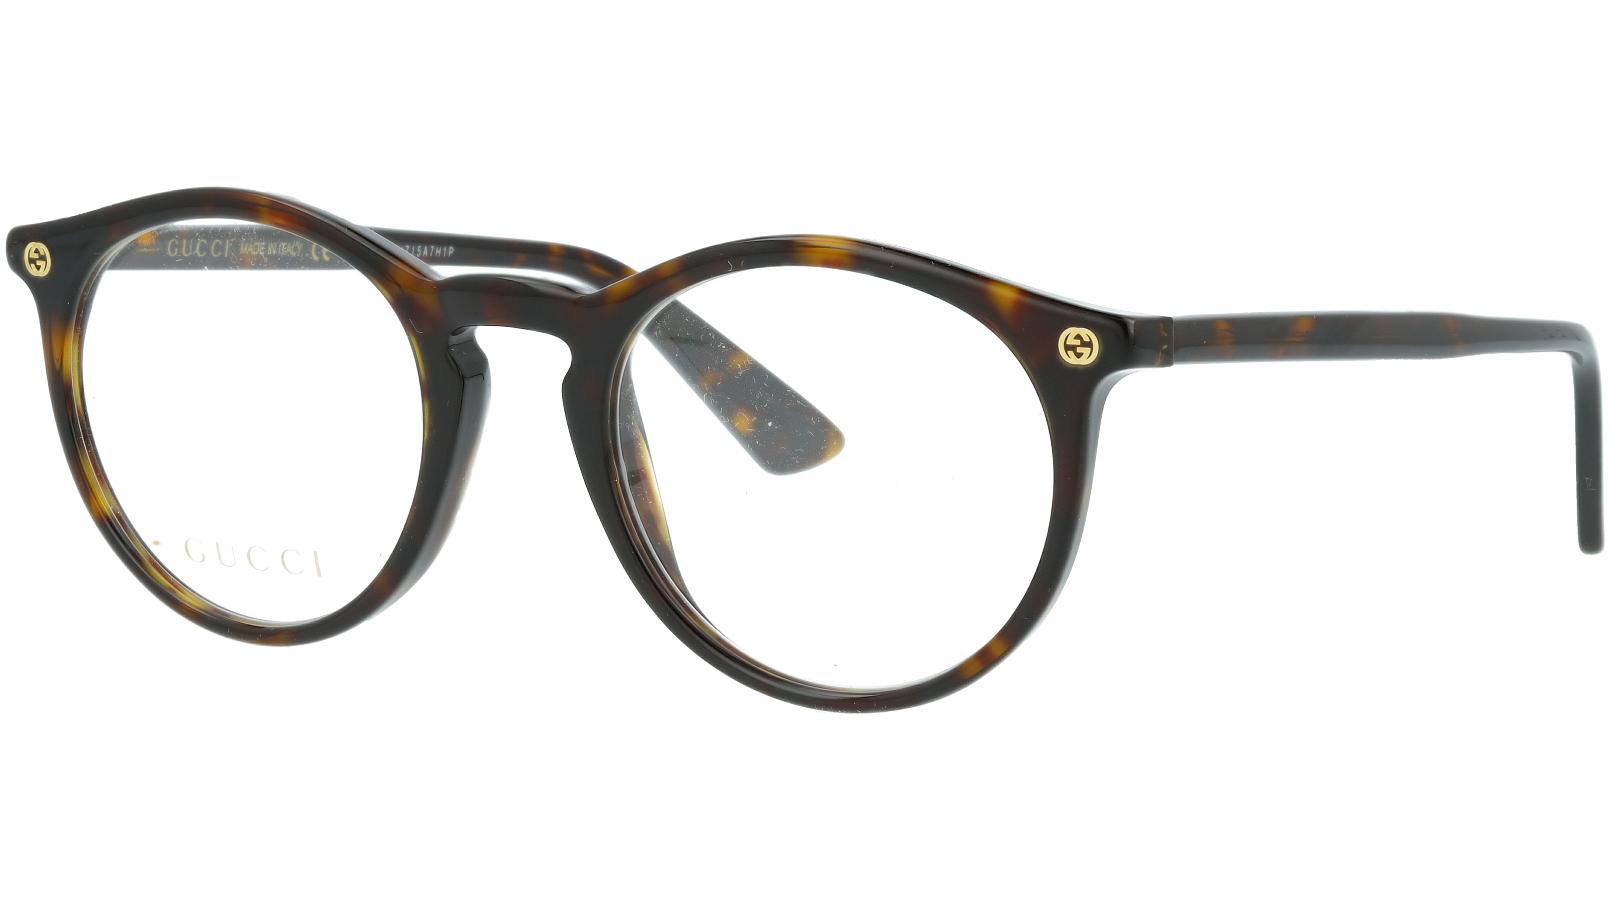 GUCCI GG0121O 002 49 AVANA Glasses